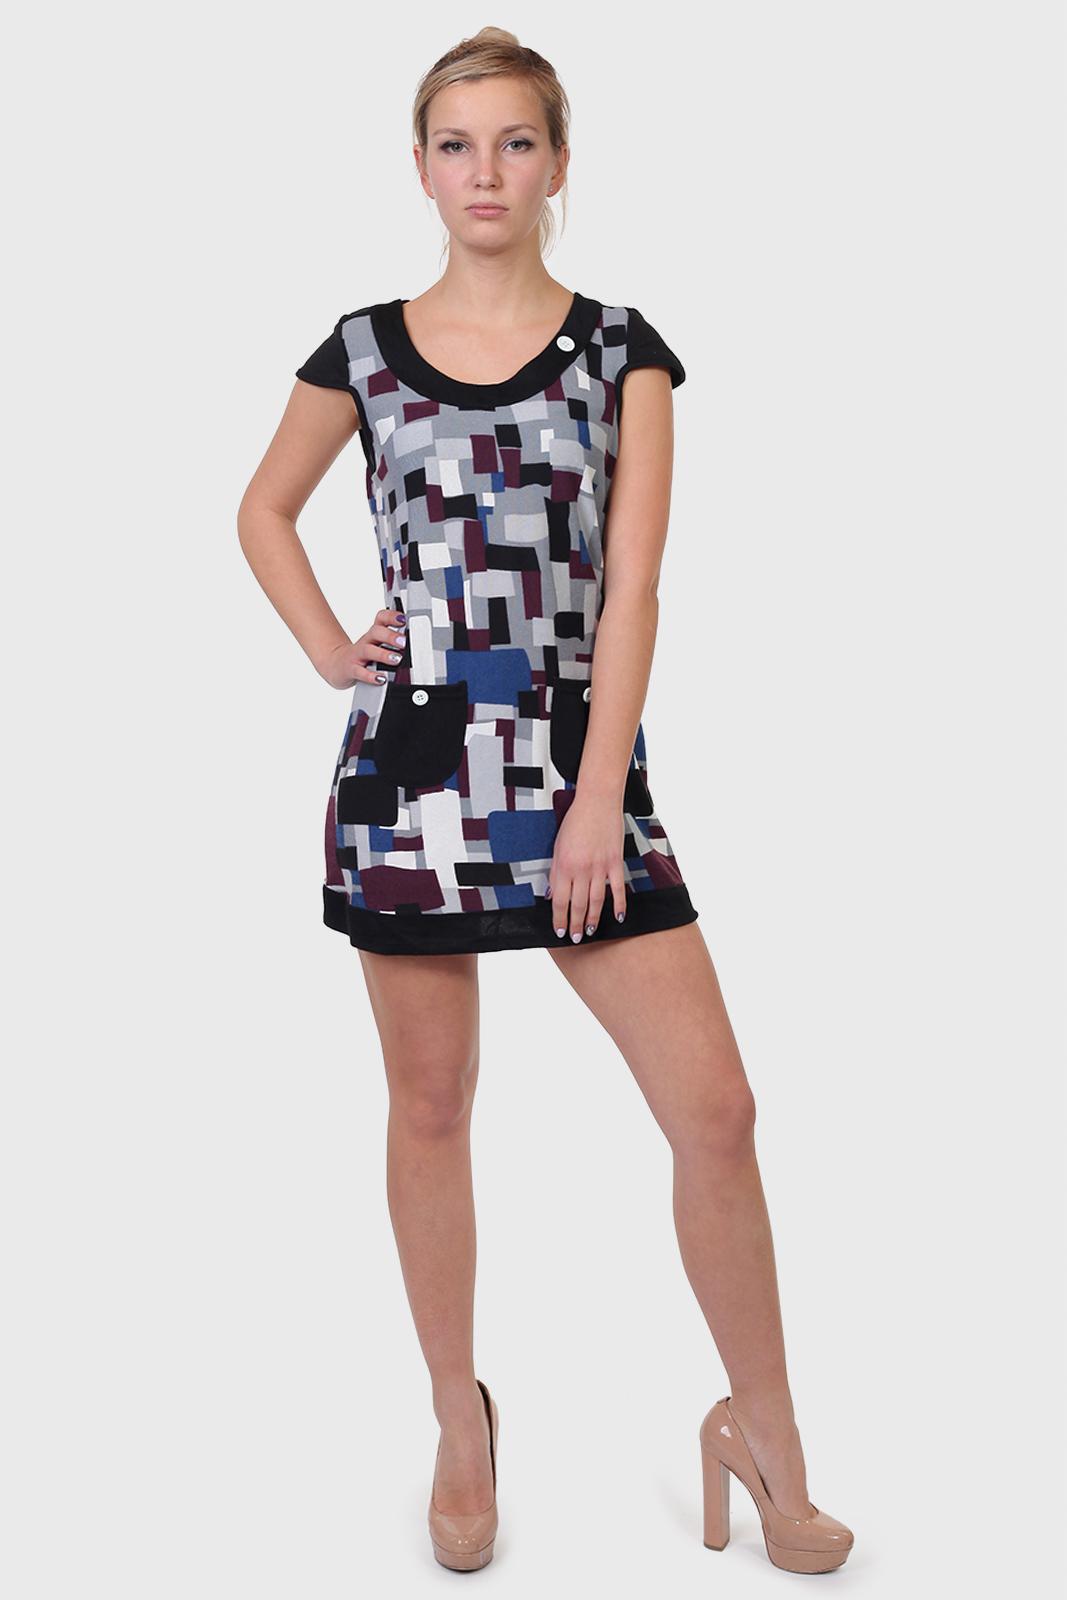 Красивое платье туника от бренда Le Grenier